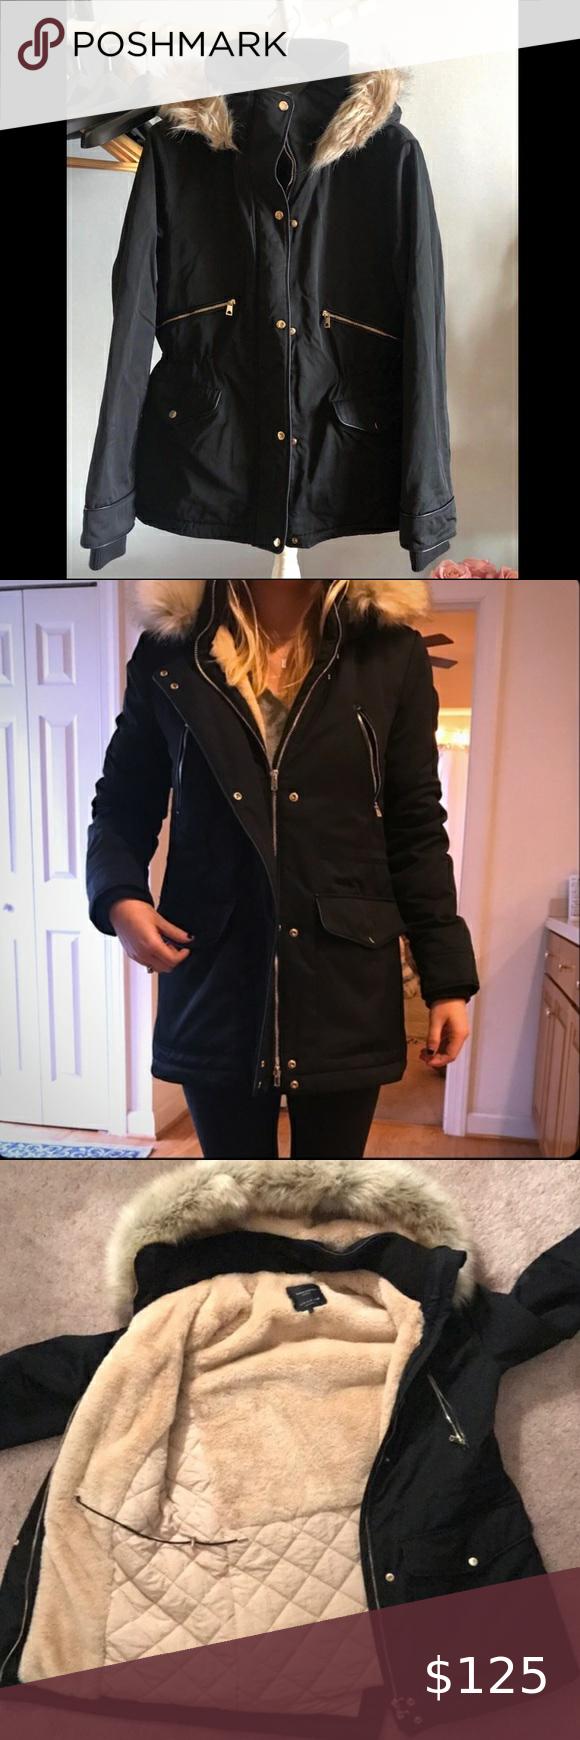 Zara Trafaluc Outerwear Winter Jacket Size Small Outerwear Winter Jackets Zara [ 1740 x 580 Pixel ]